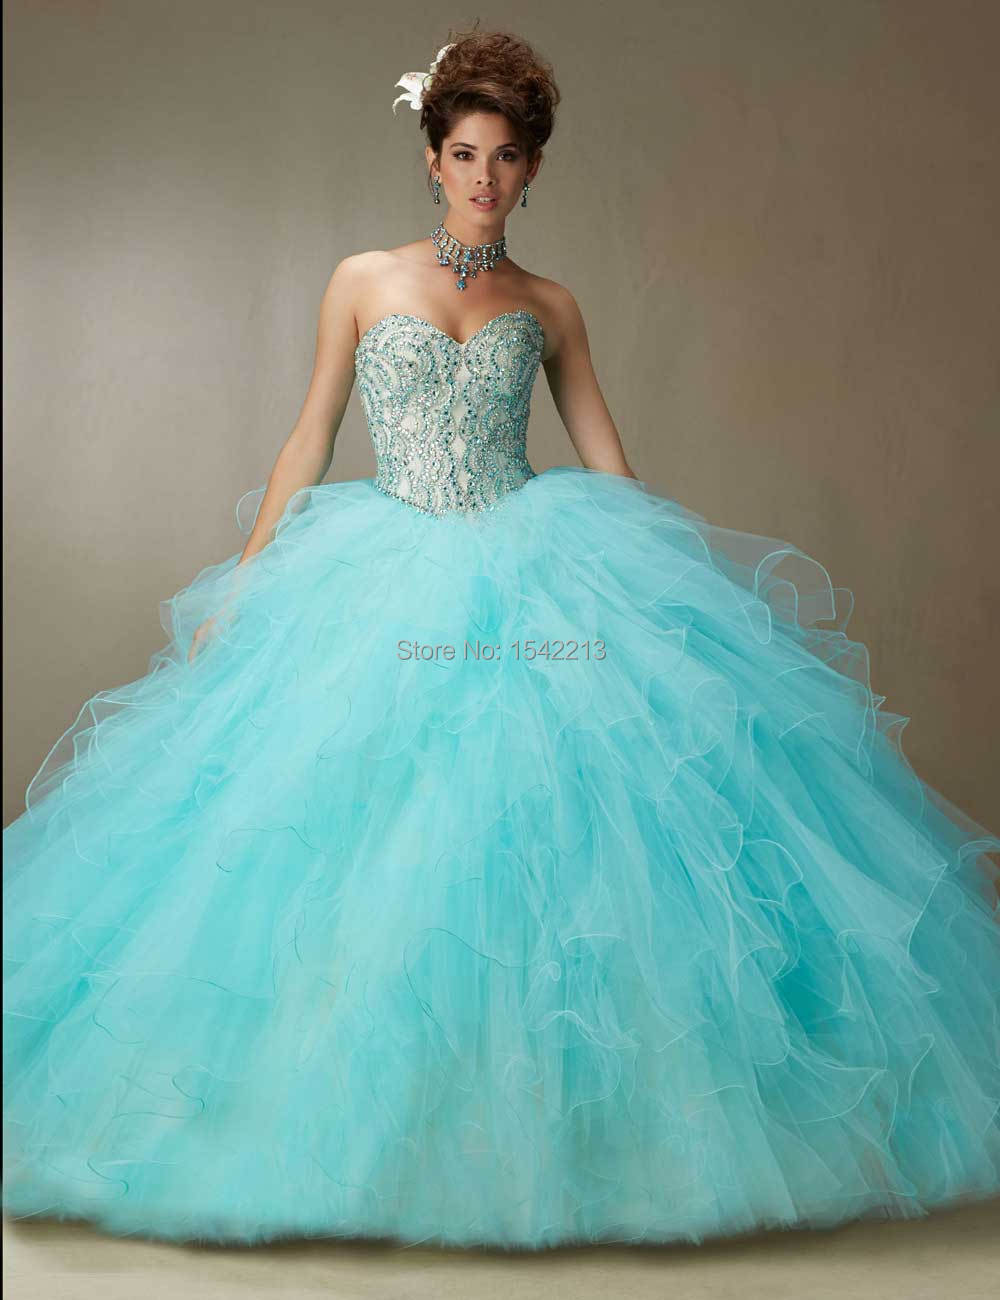 Coral Blue Sweet 16 Dresses